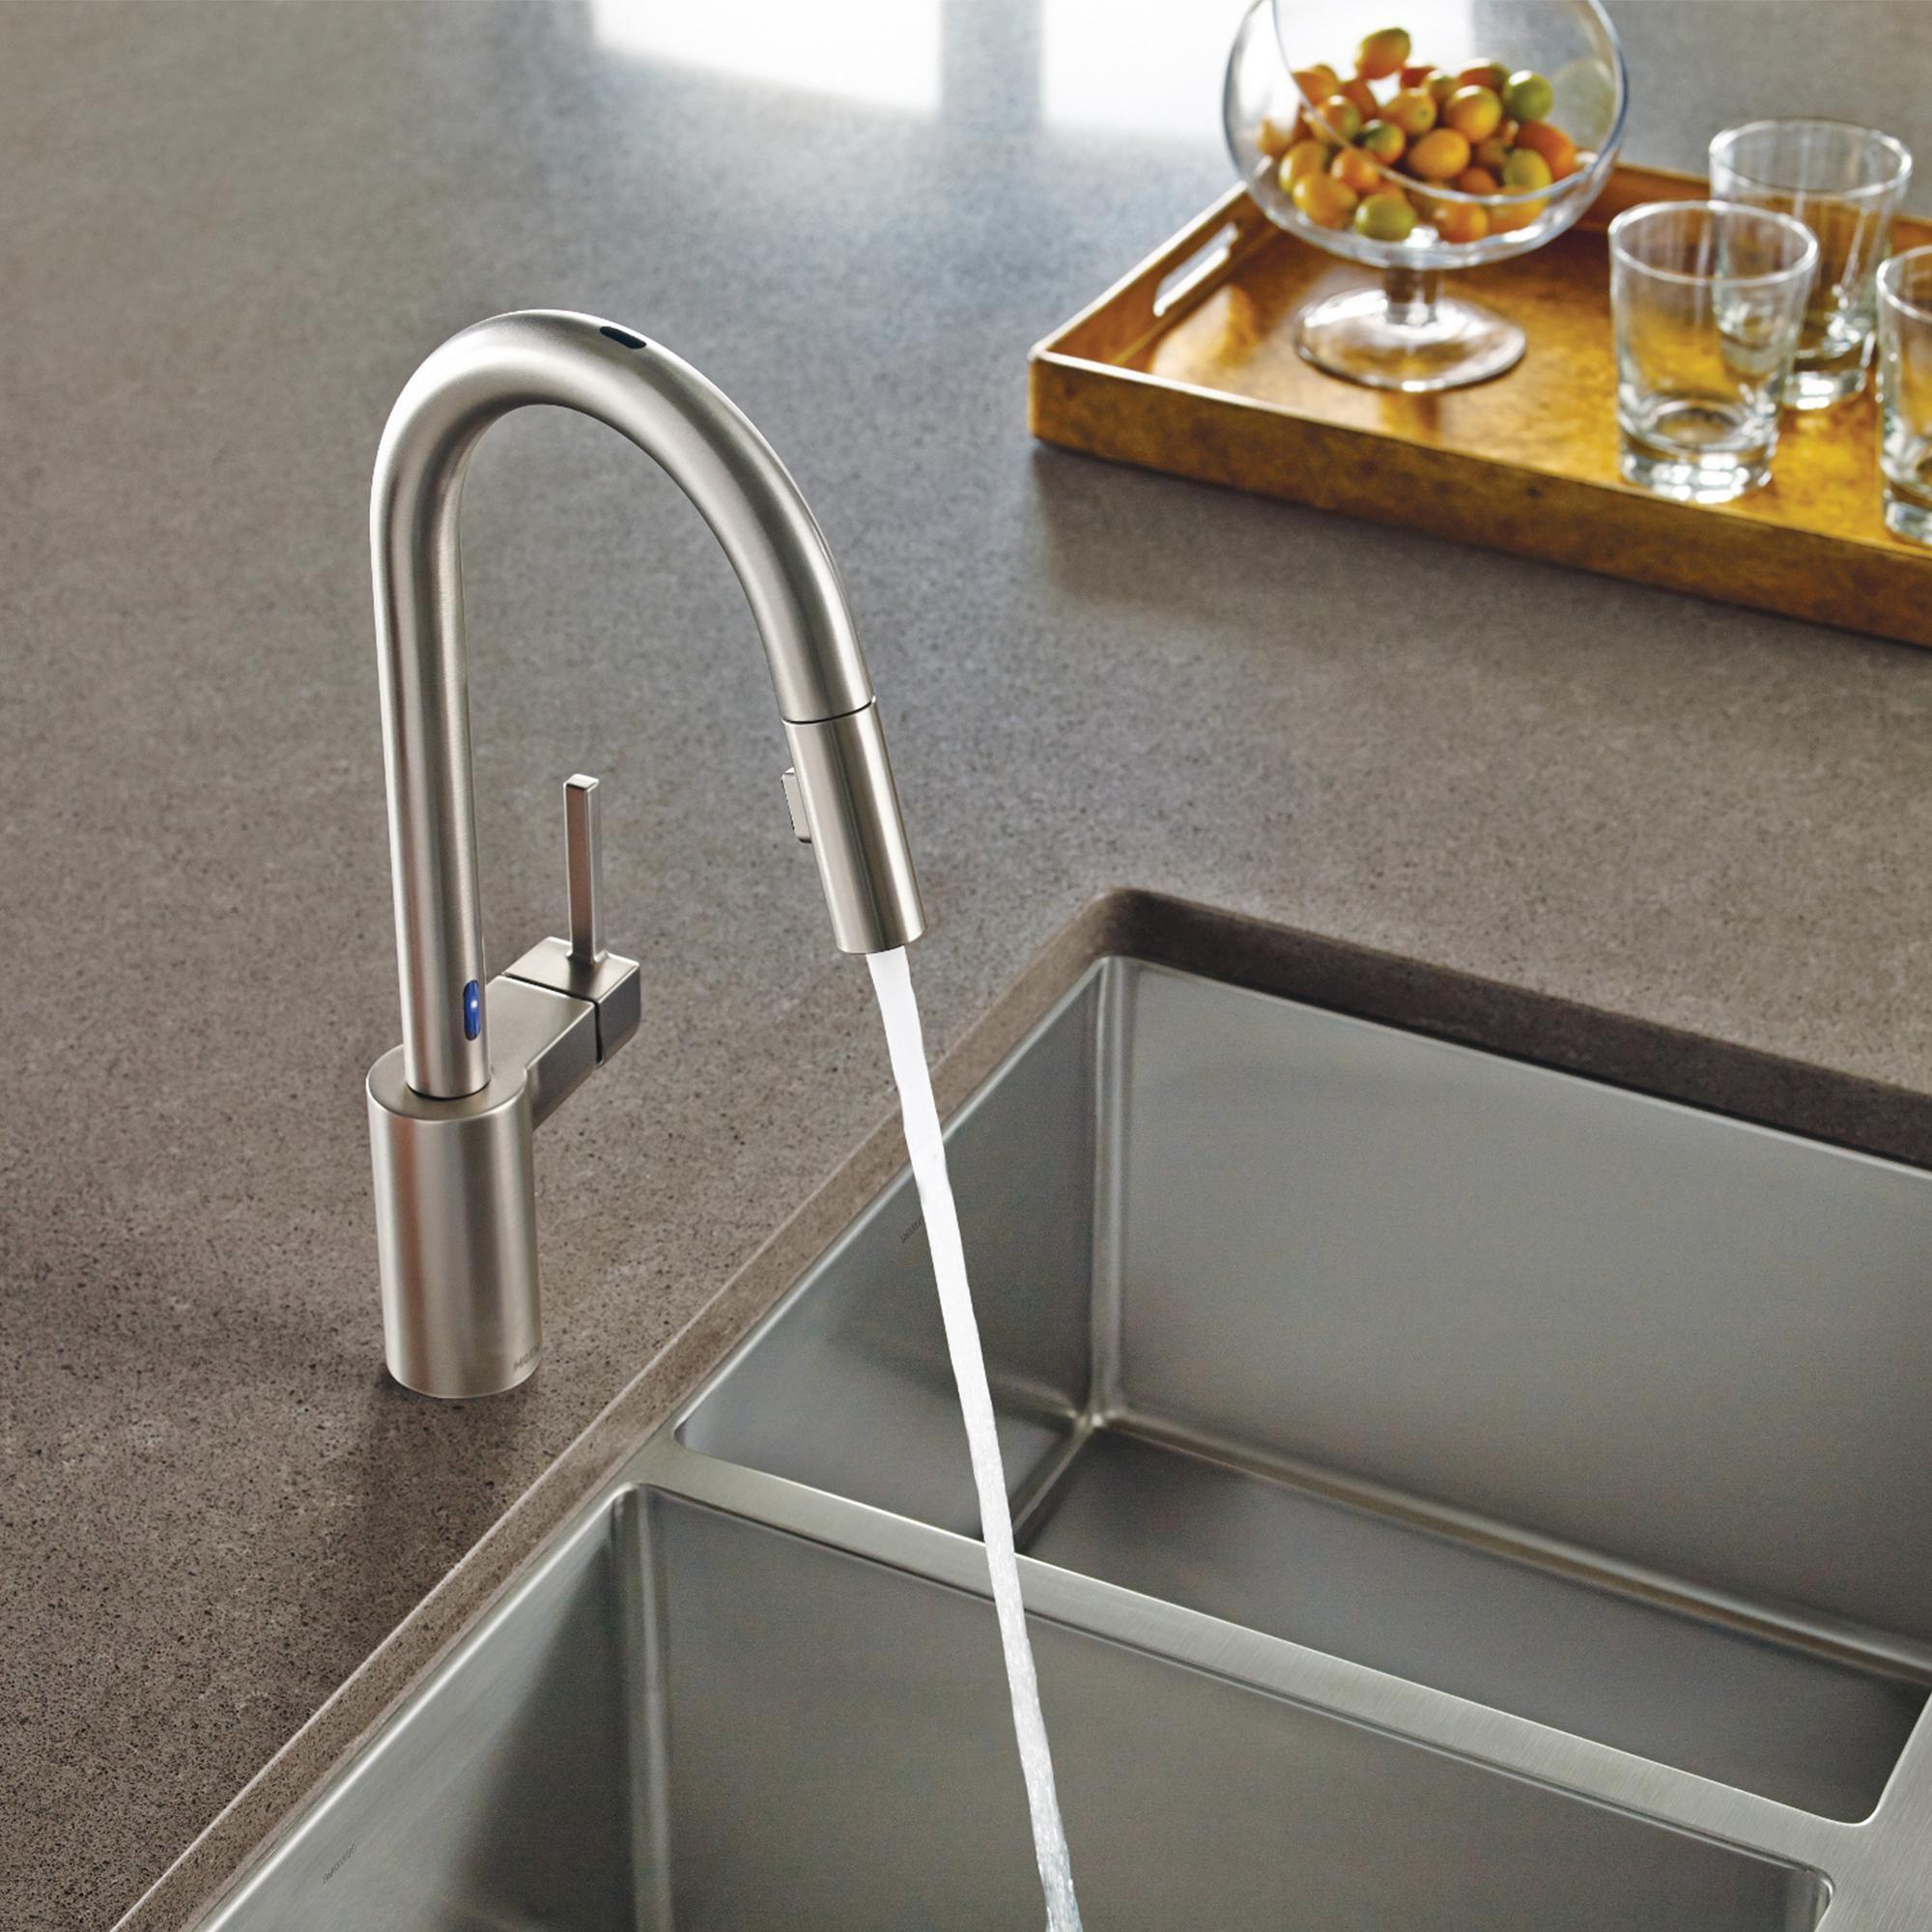 Moen 7565SRS Align e Handle High Arc Pulldown Kitchen Faucet